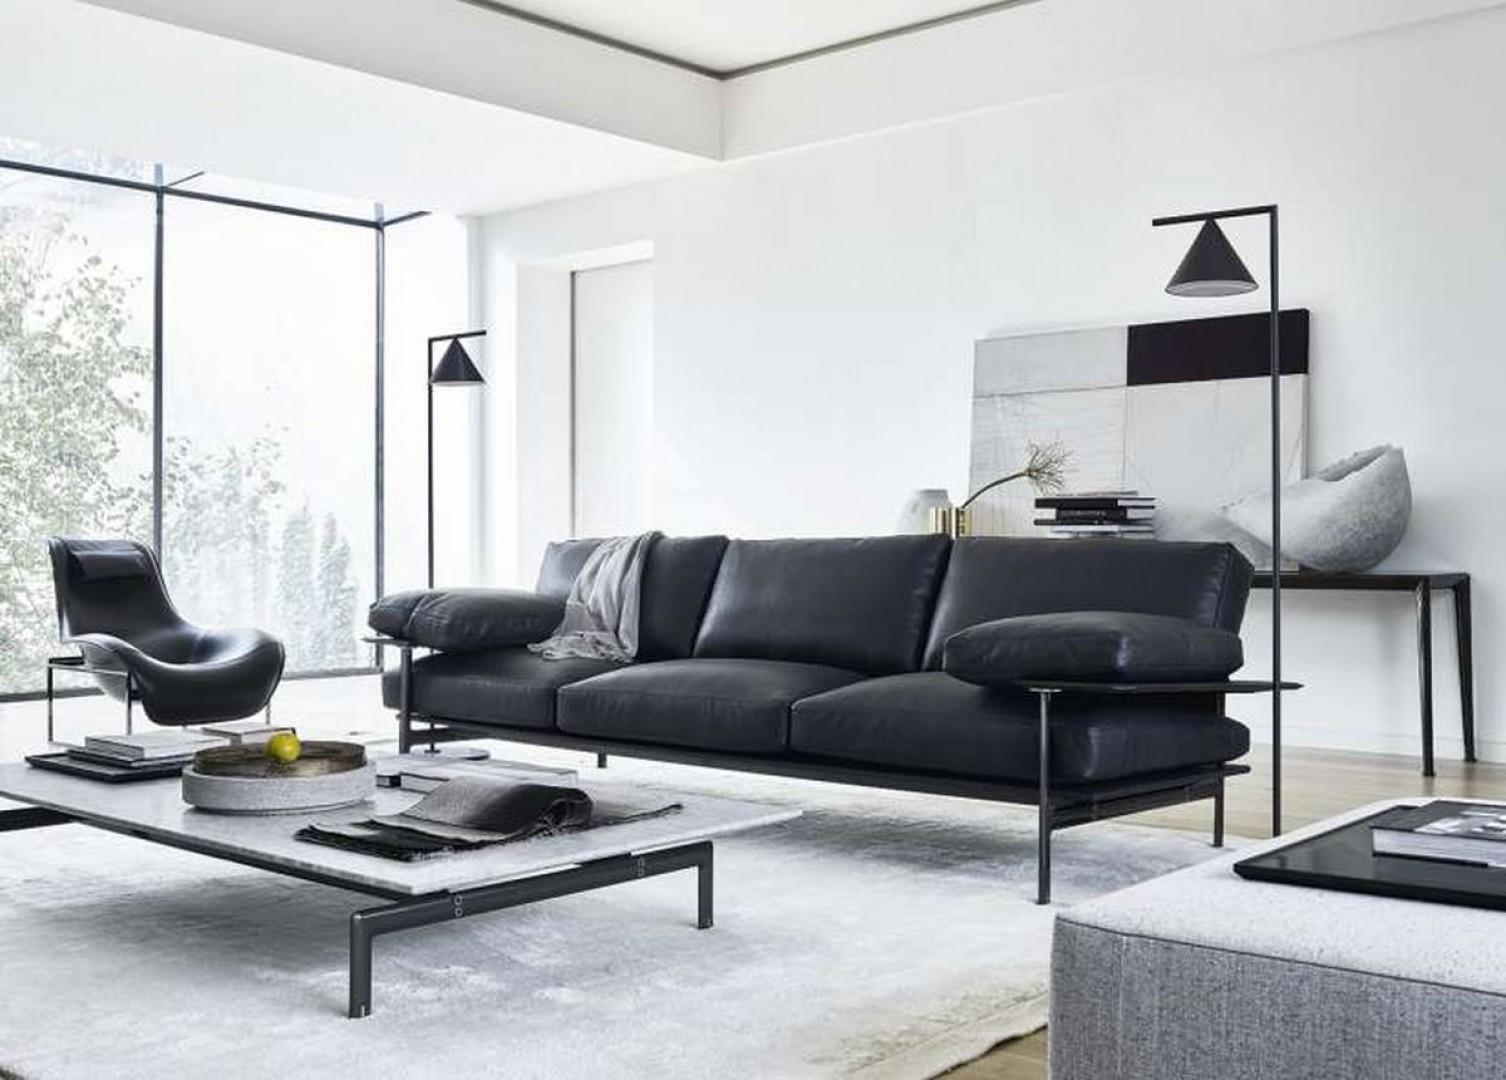 Sofa Diesis firmy B&B Italia. Projekt: Antonio Citterio. Fot. B&B Italia